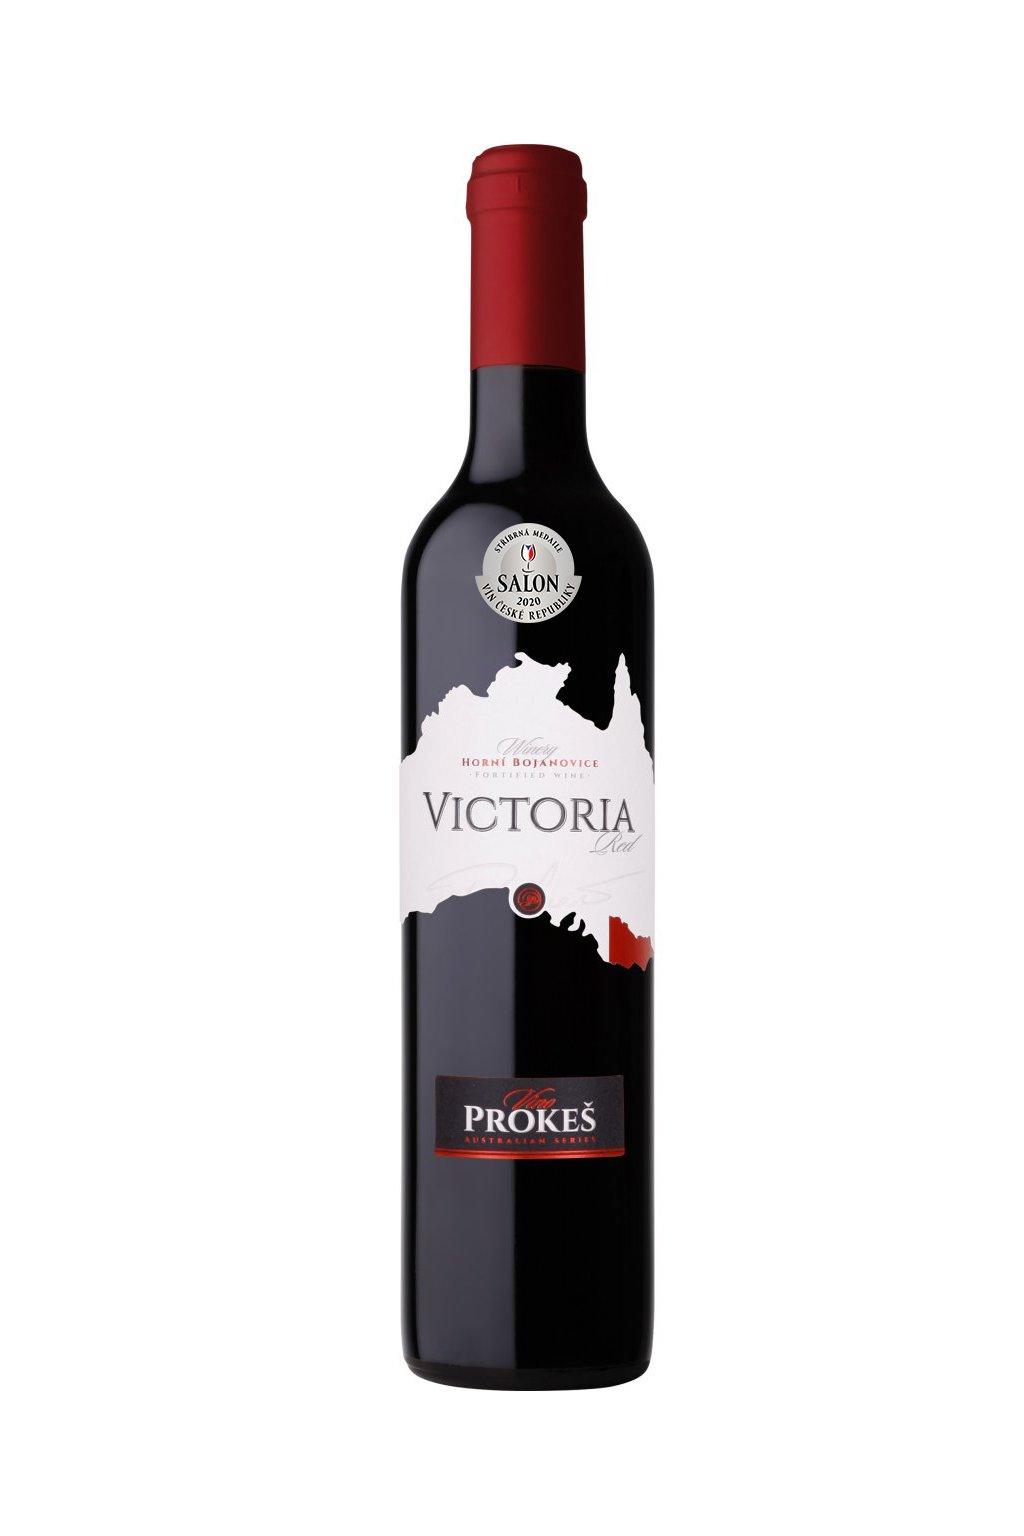 PROKES Vin FOTOMONTAZ lahve VIKTORIA Red